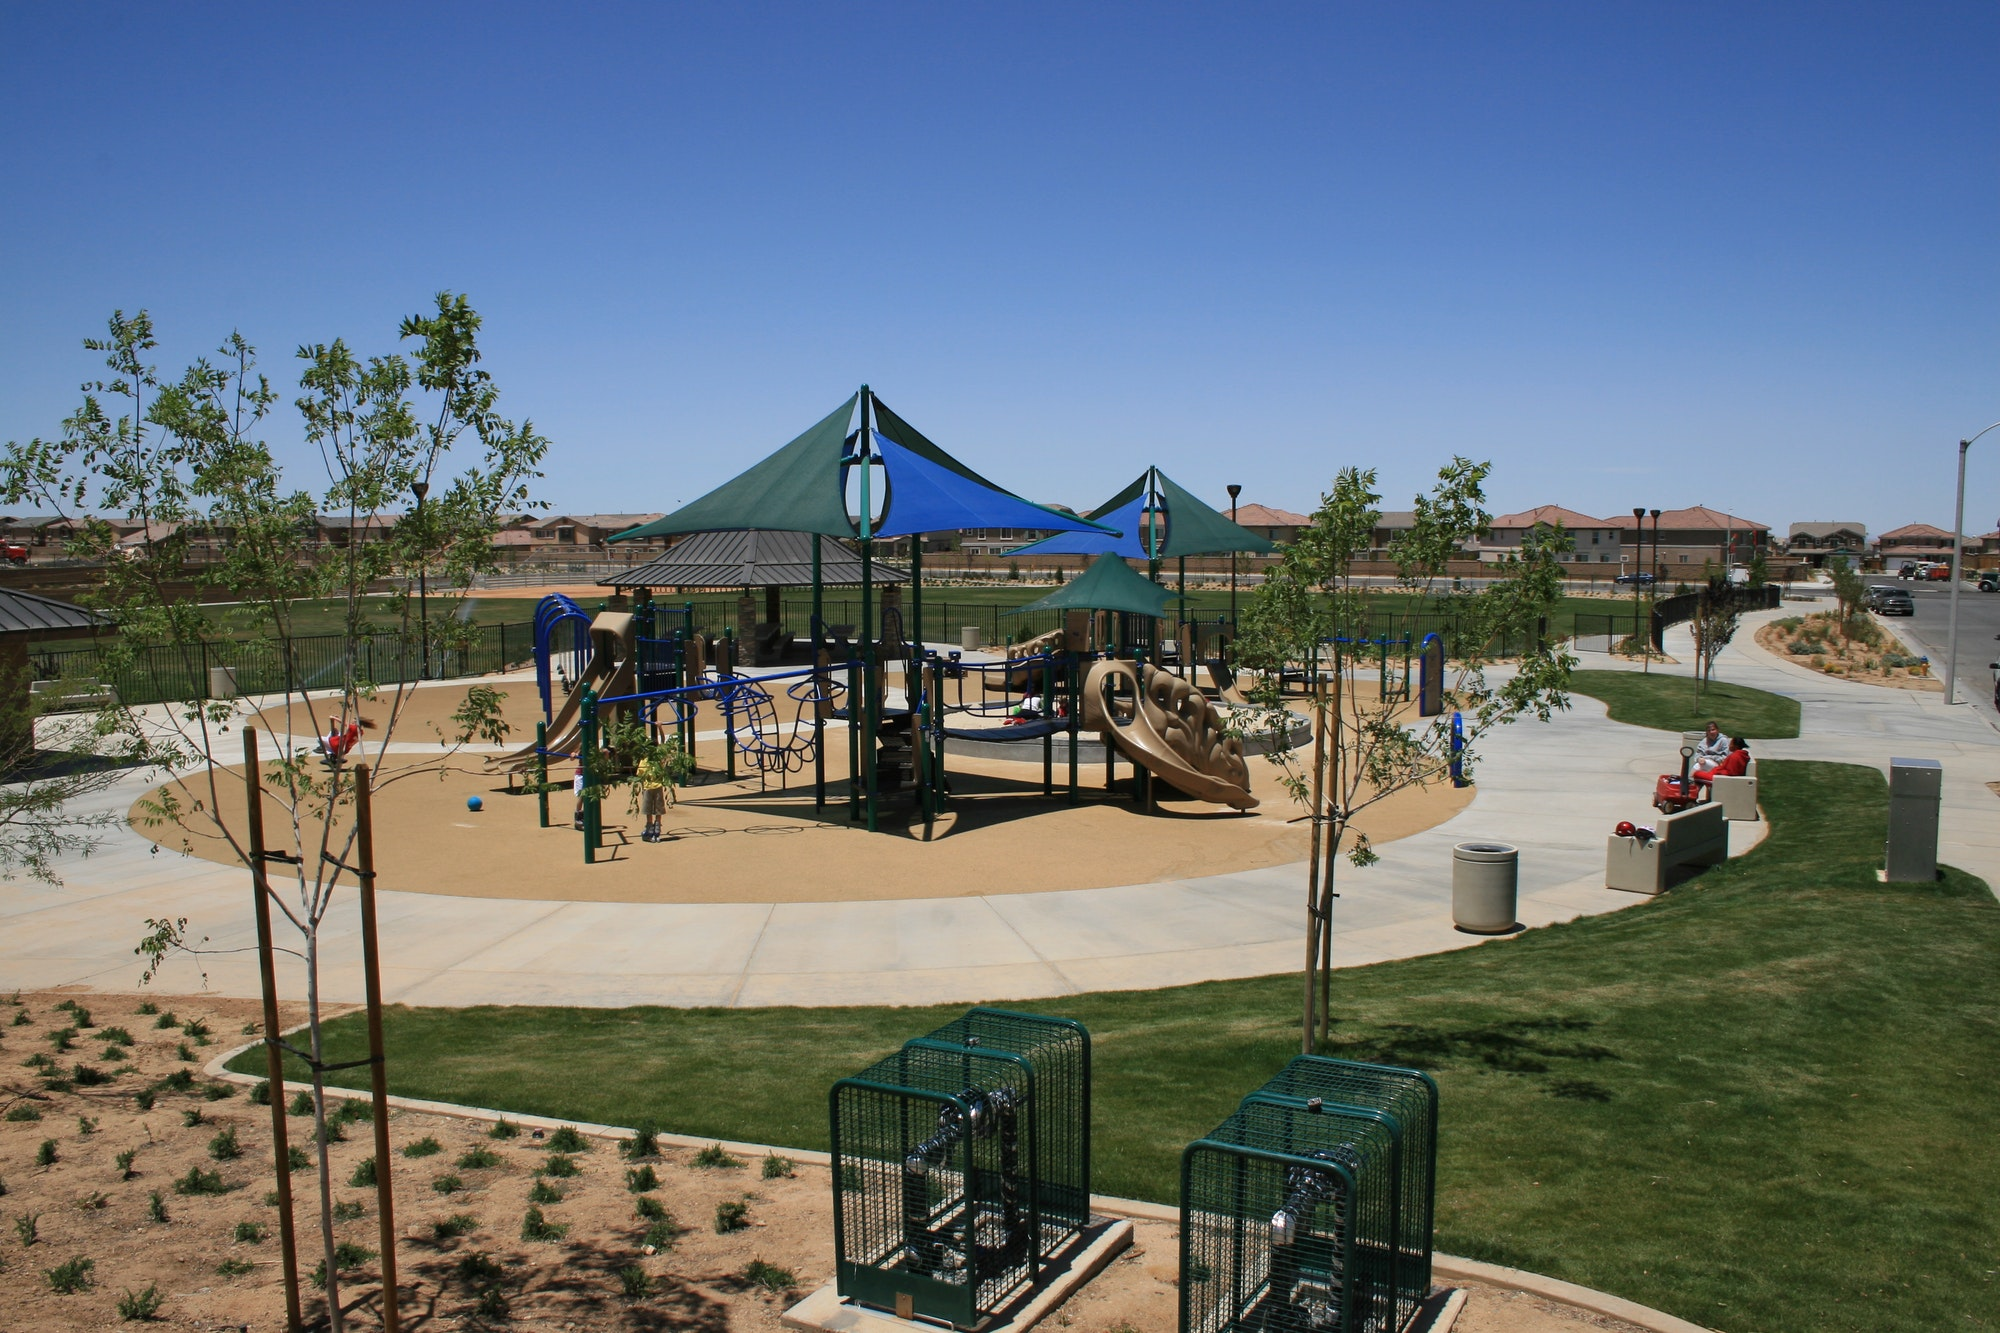 Malibu Park playground